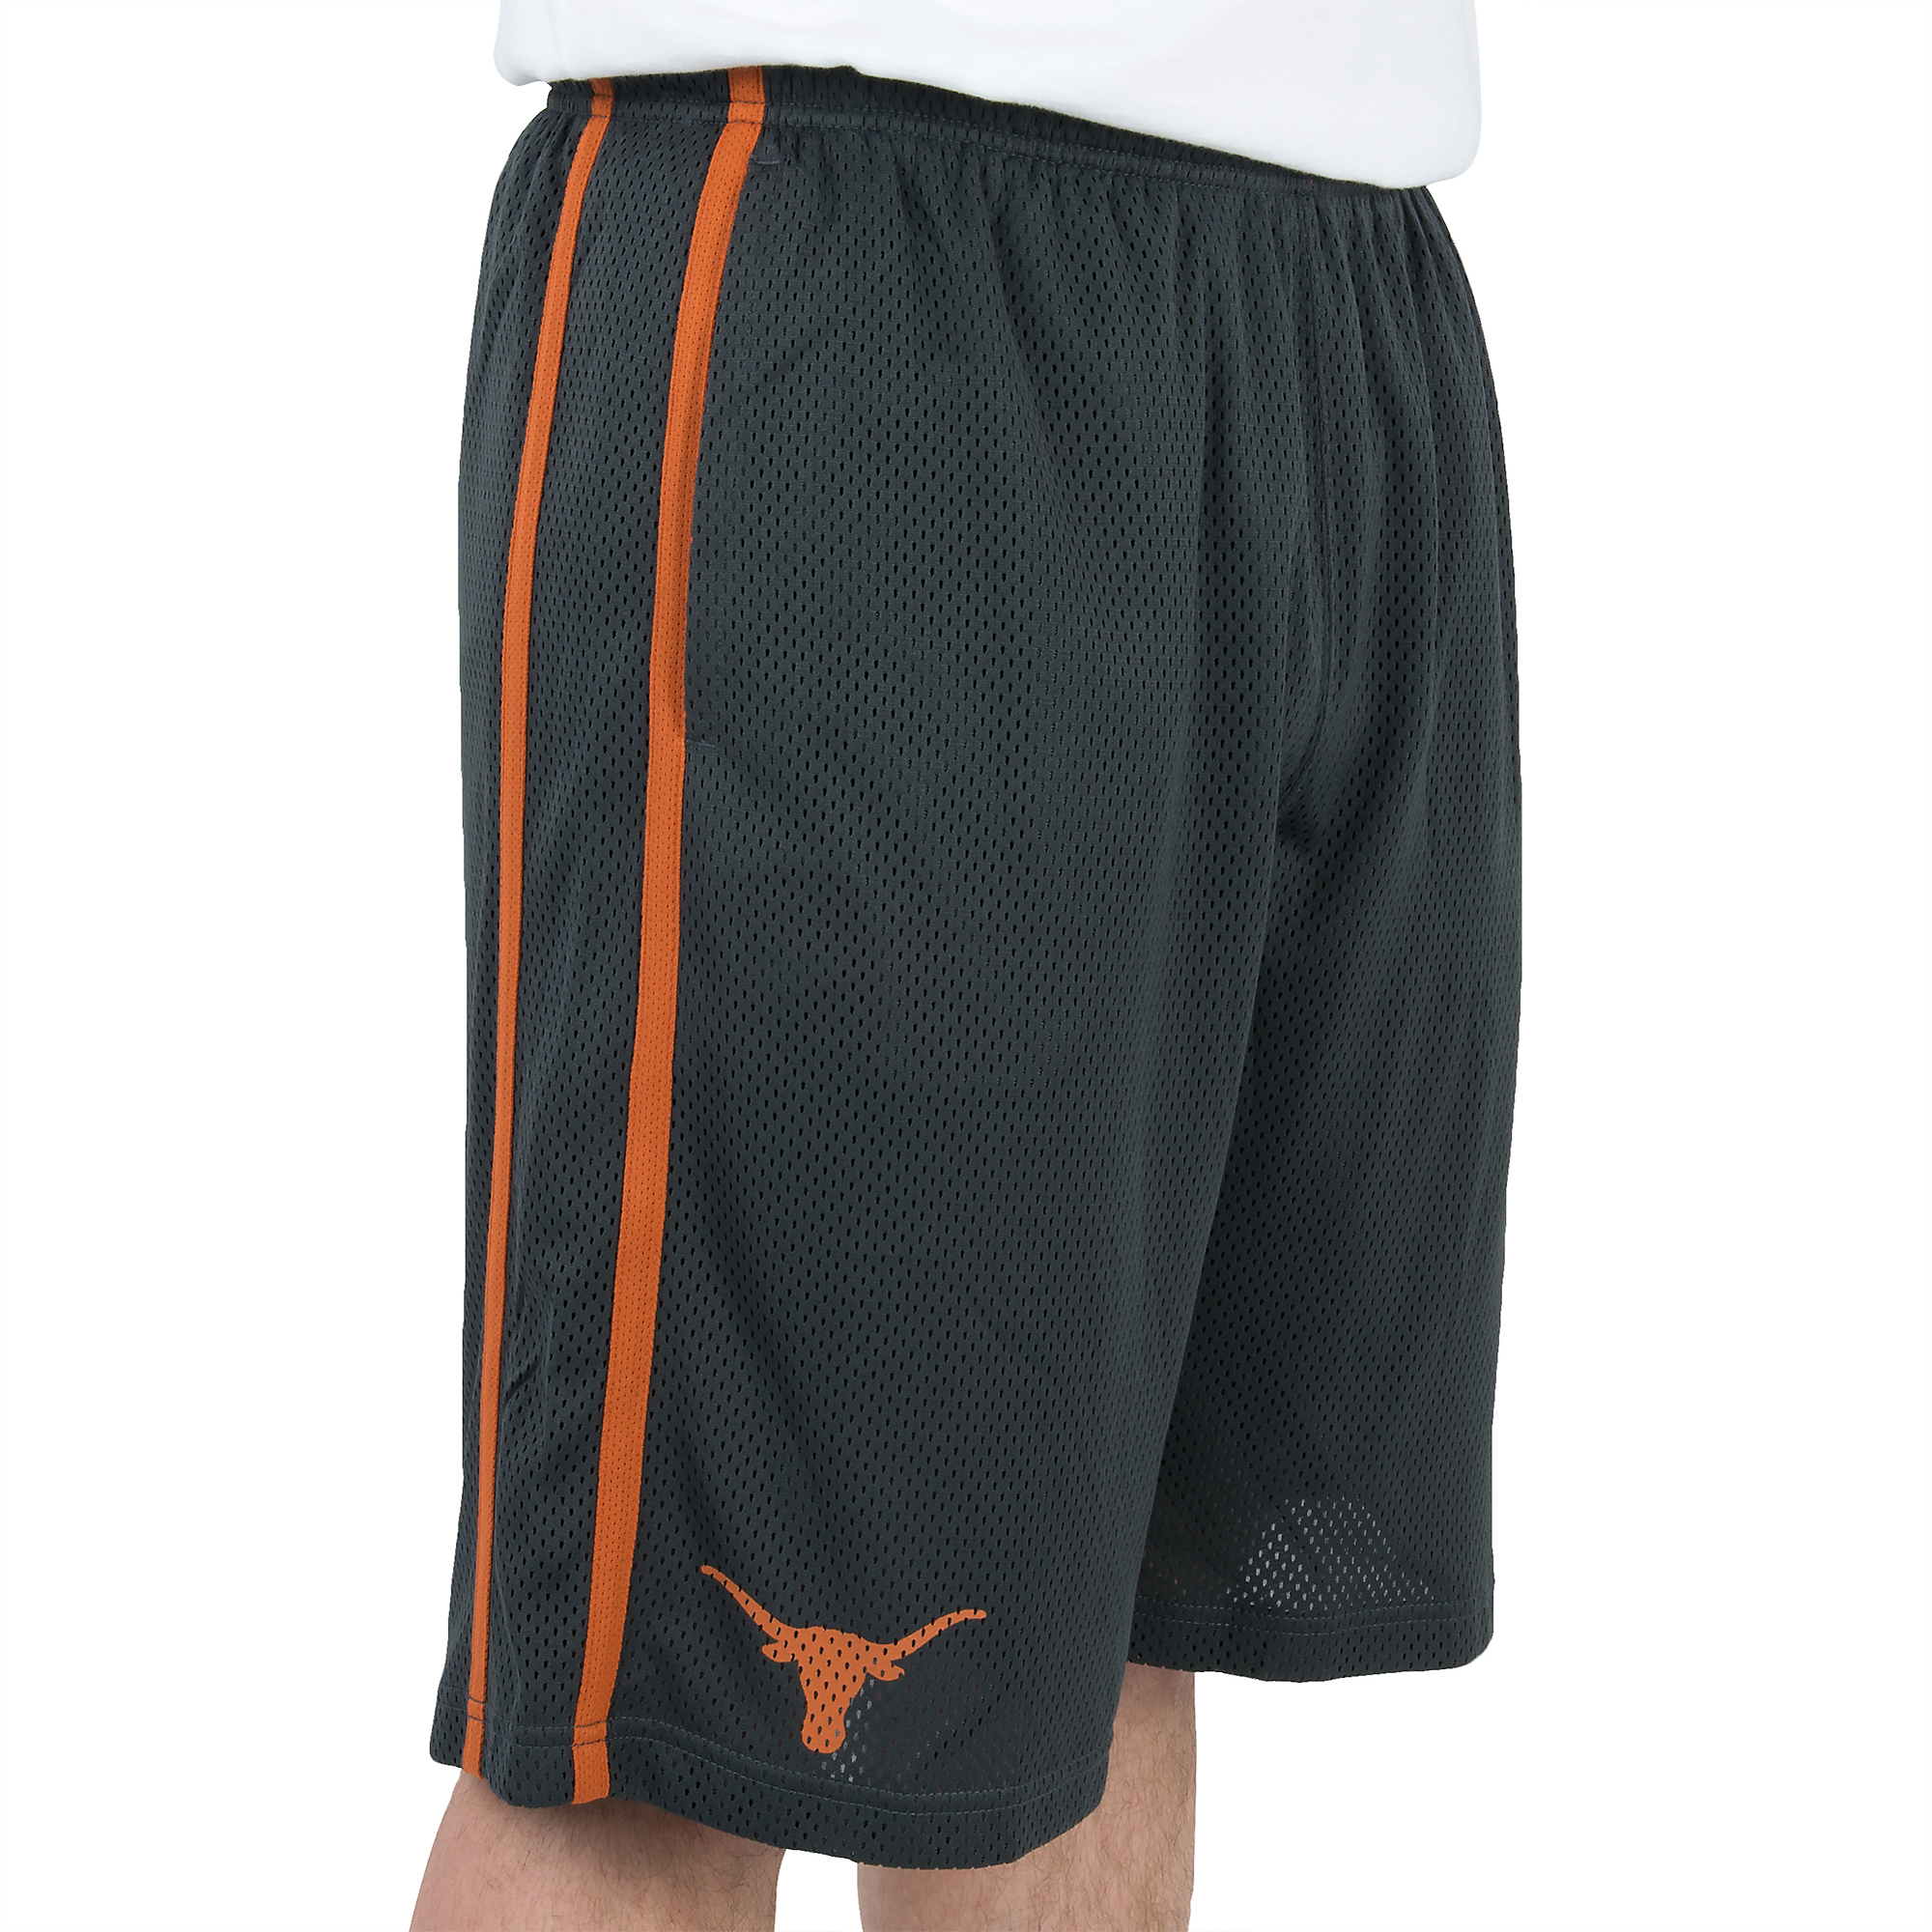 Texas Longhorns Nike Team Issue Shorts